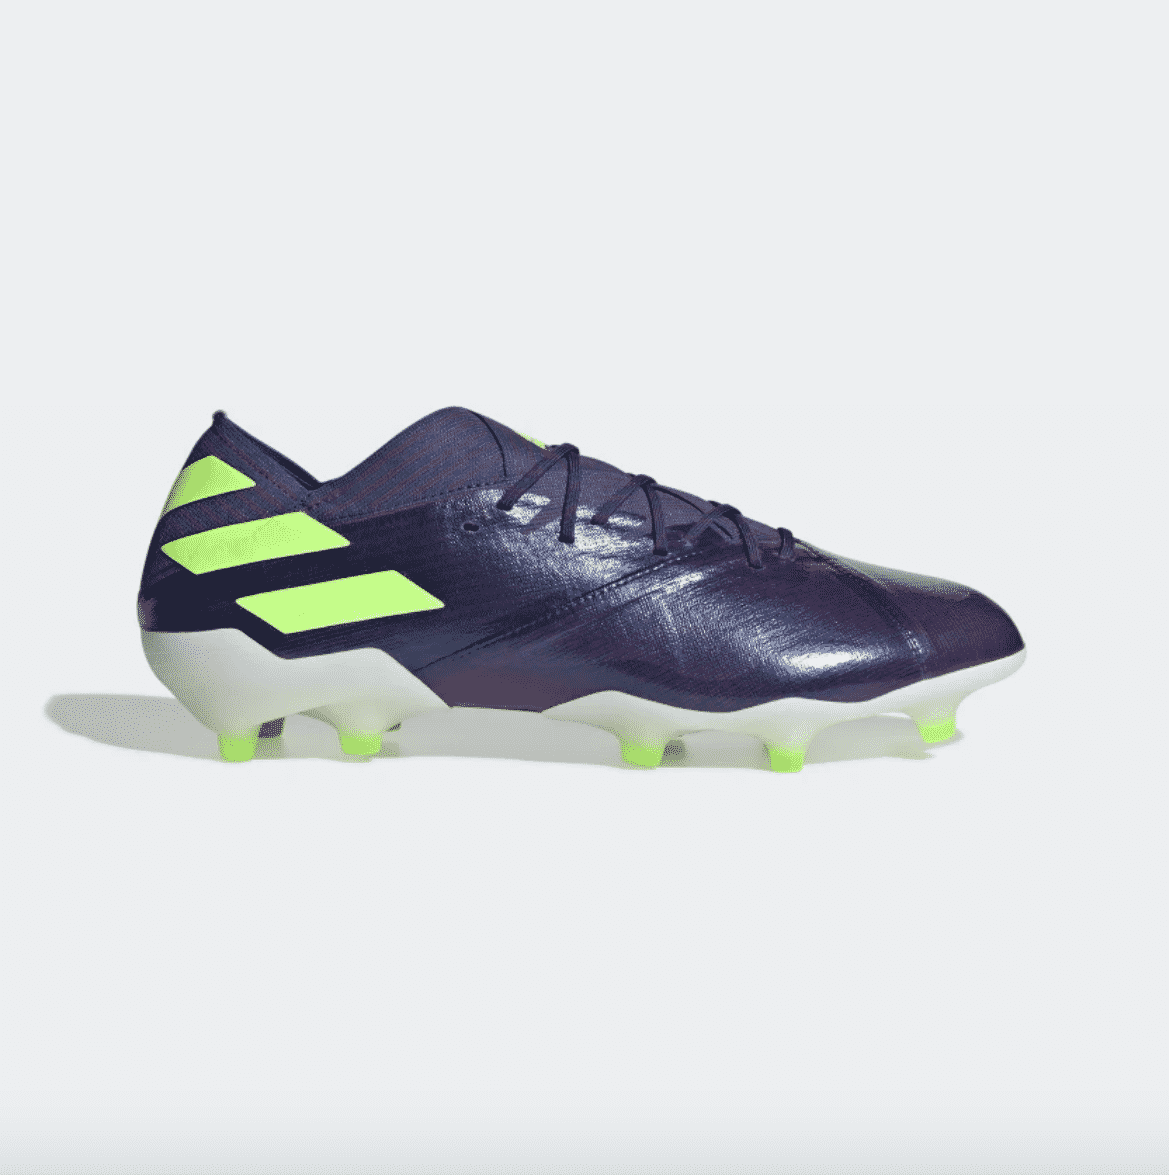 chaussures-adidas-nemeziz-19.1-lionel-messi-ballon-or-2019-1